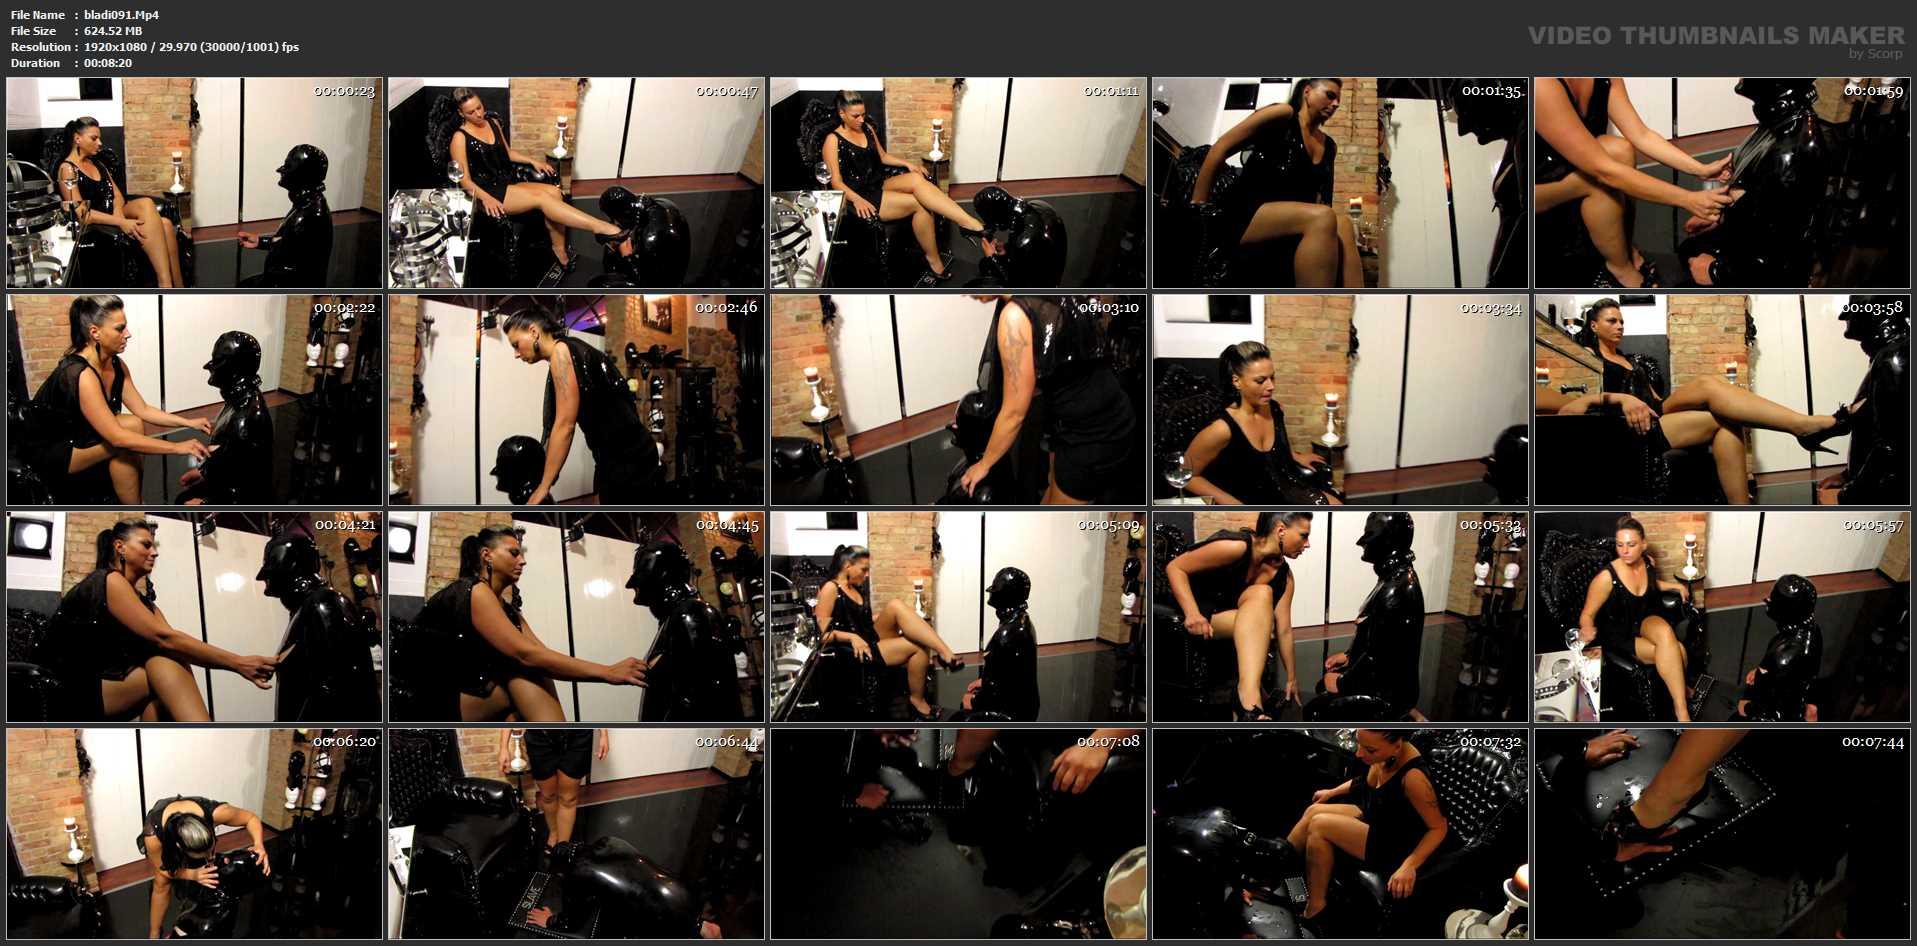 Mistress Blackdiamoond In Scene: Sexy high heels worship - CLIPS4SALE / BLACKDIAMOOND - FULL HD/1080p/MP4